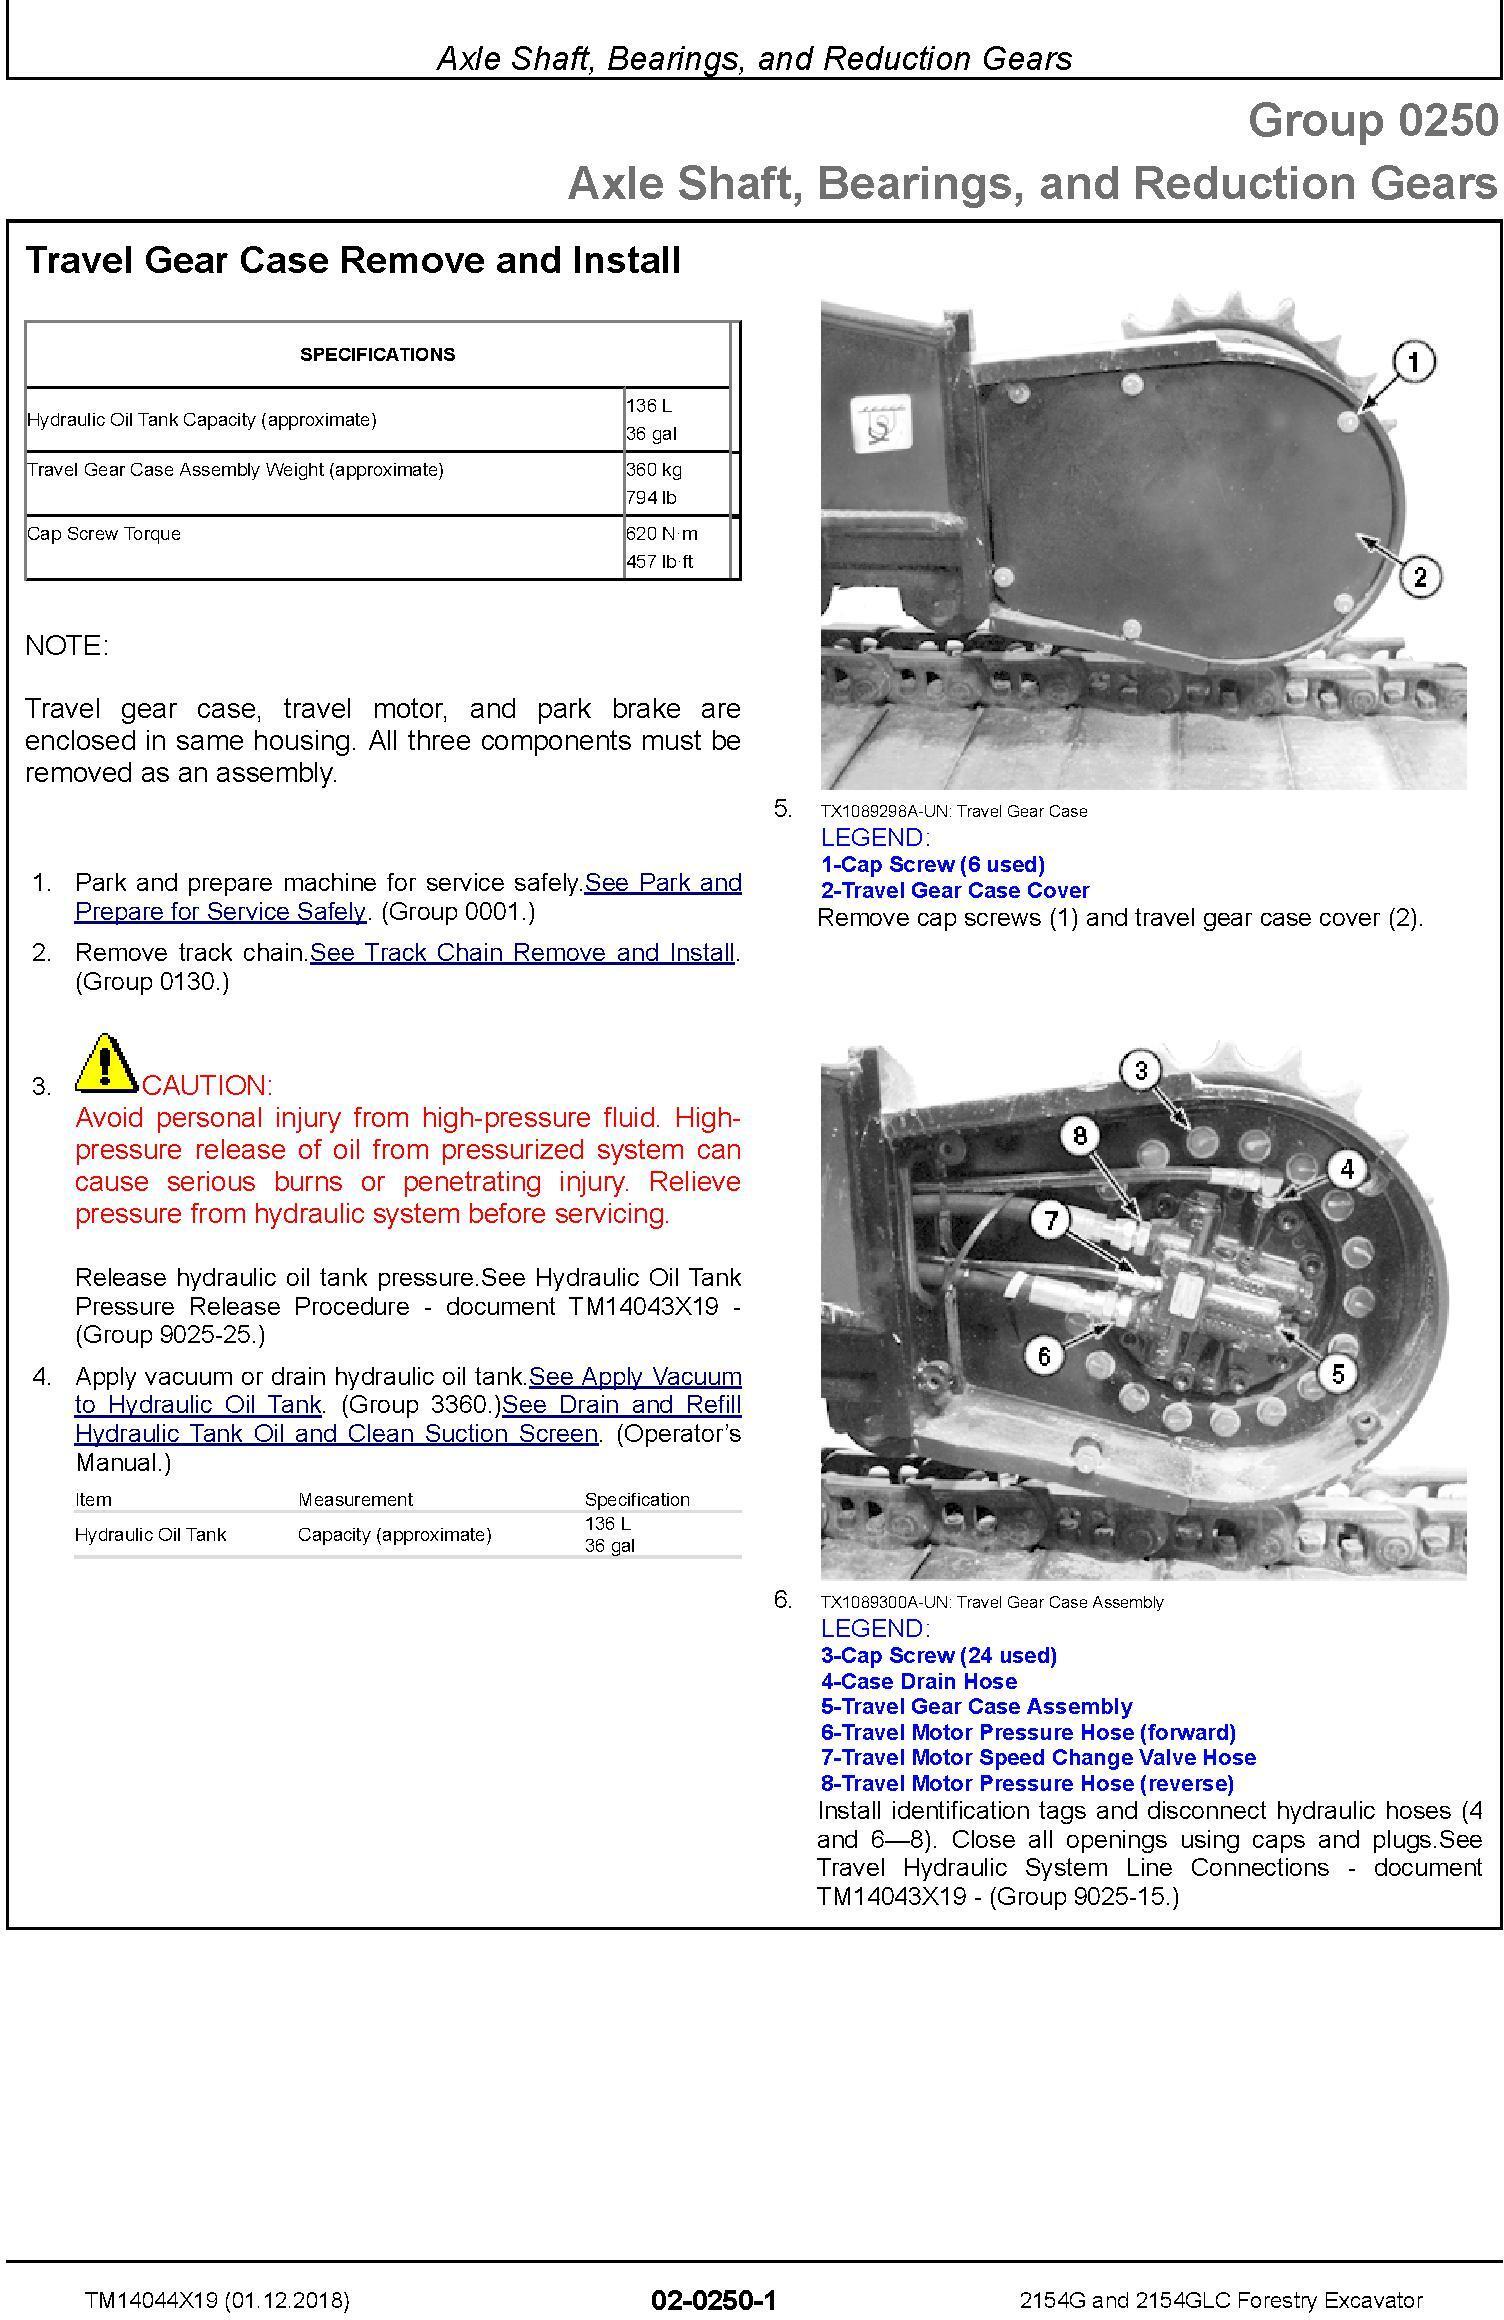 John Deere 2154G,2154GLC (SN.C212001-,D212001-) Forestry Excavator Repair Service Manual(TM14044X19) - 3